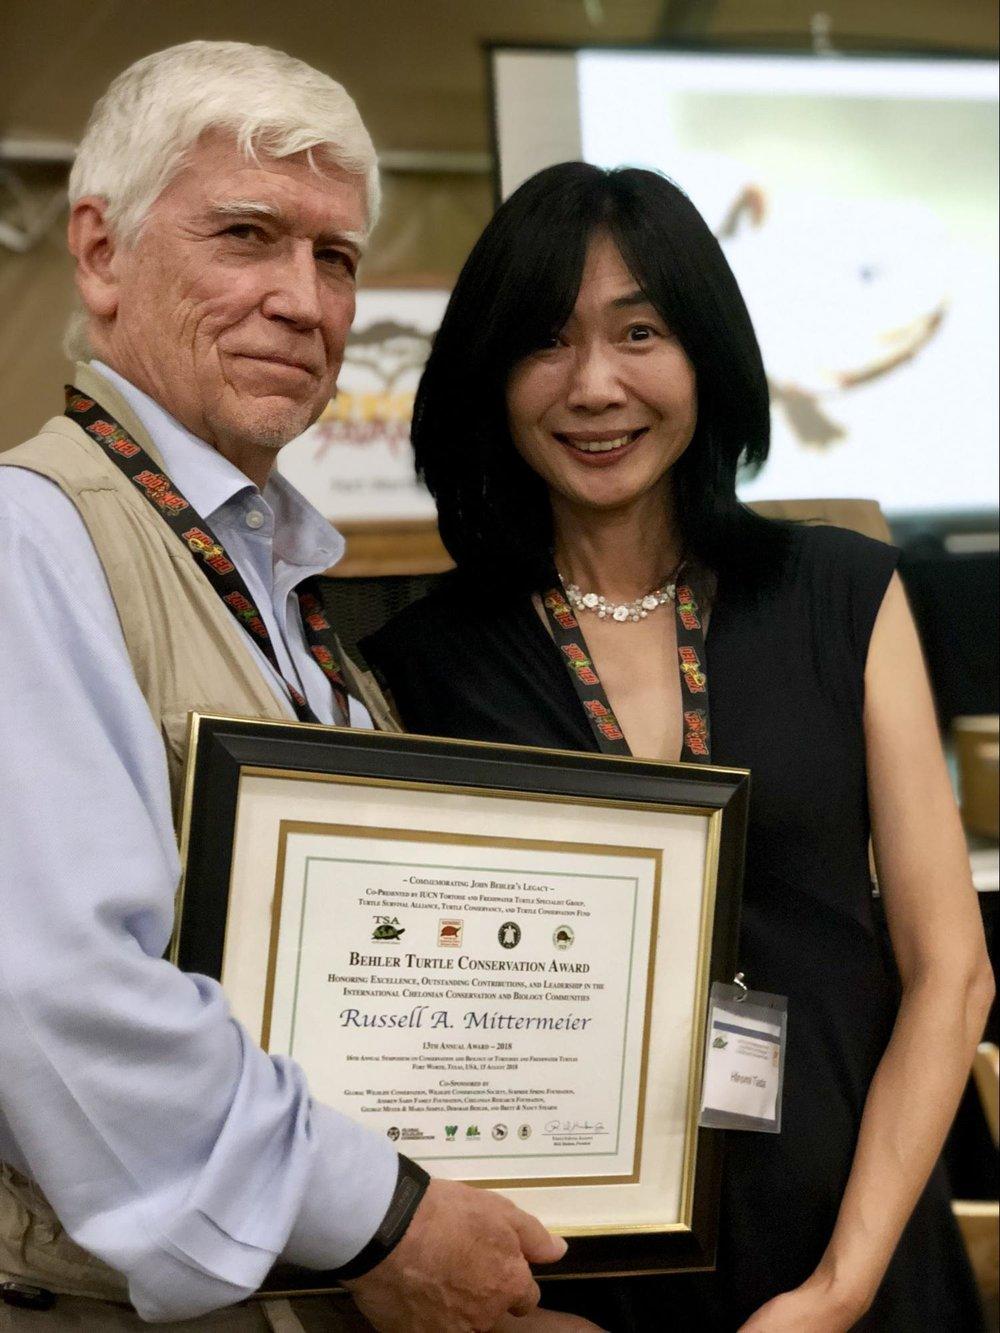 Russell Mittermeier and Hiromi Tada